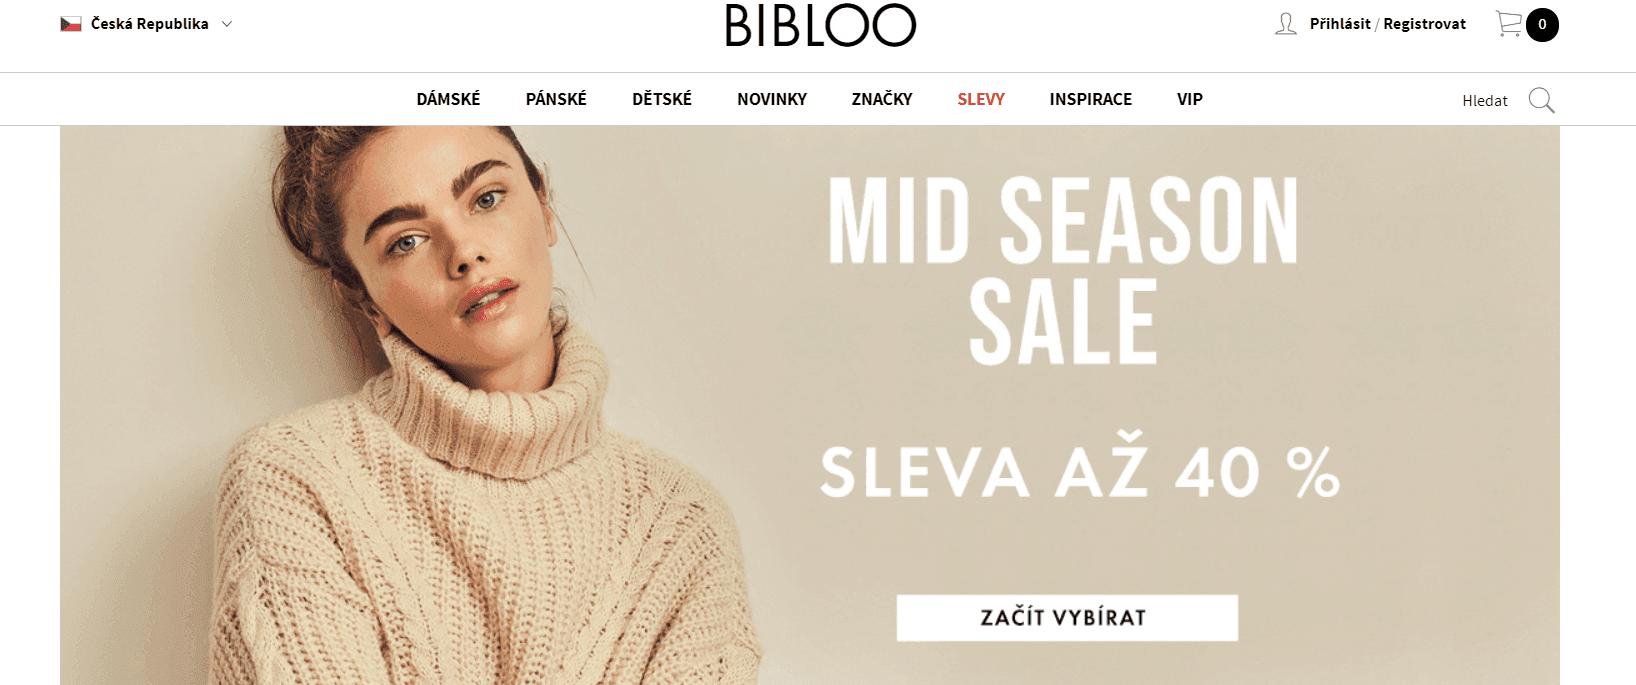 Bibloo 1 купити онлайн з доставкою в Україну - myMeest - 2